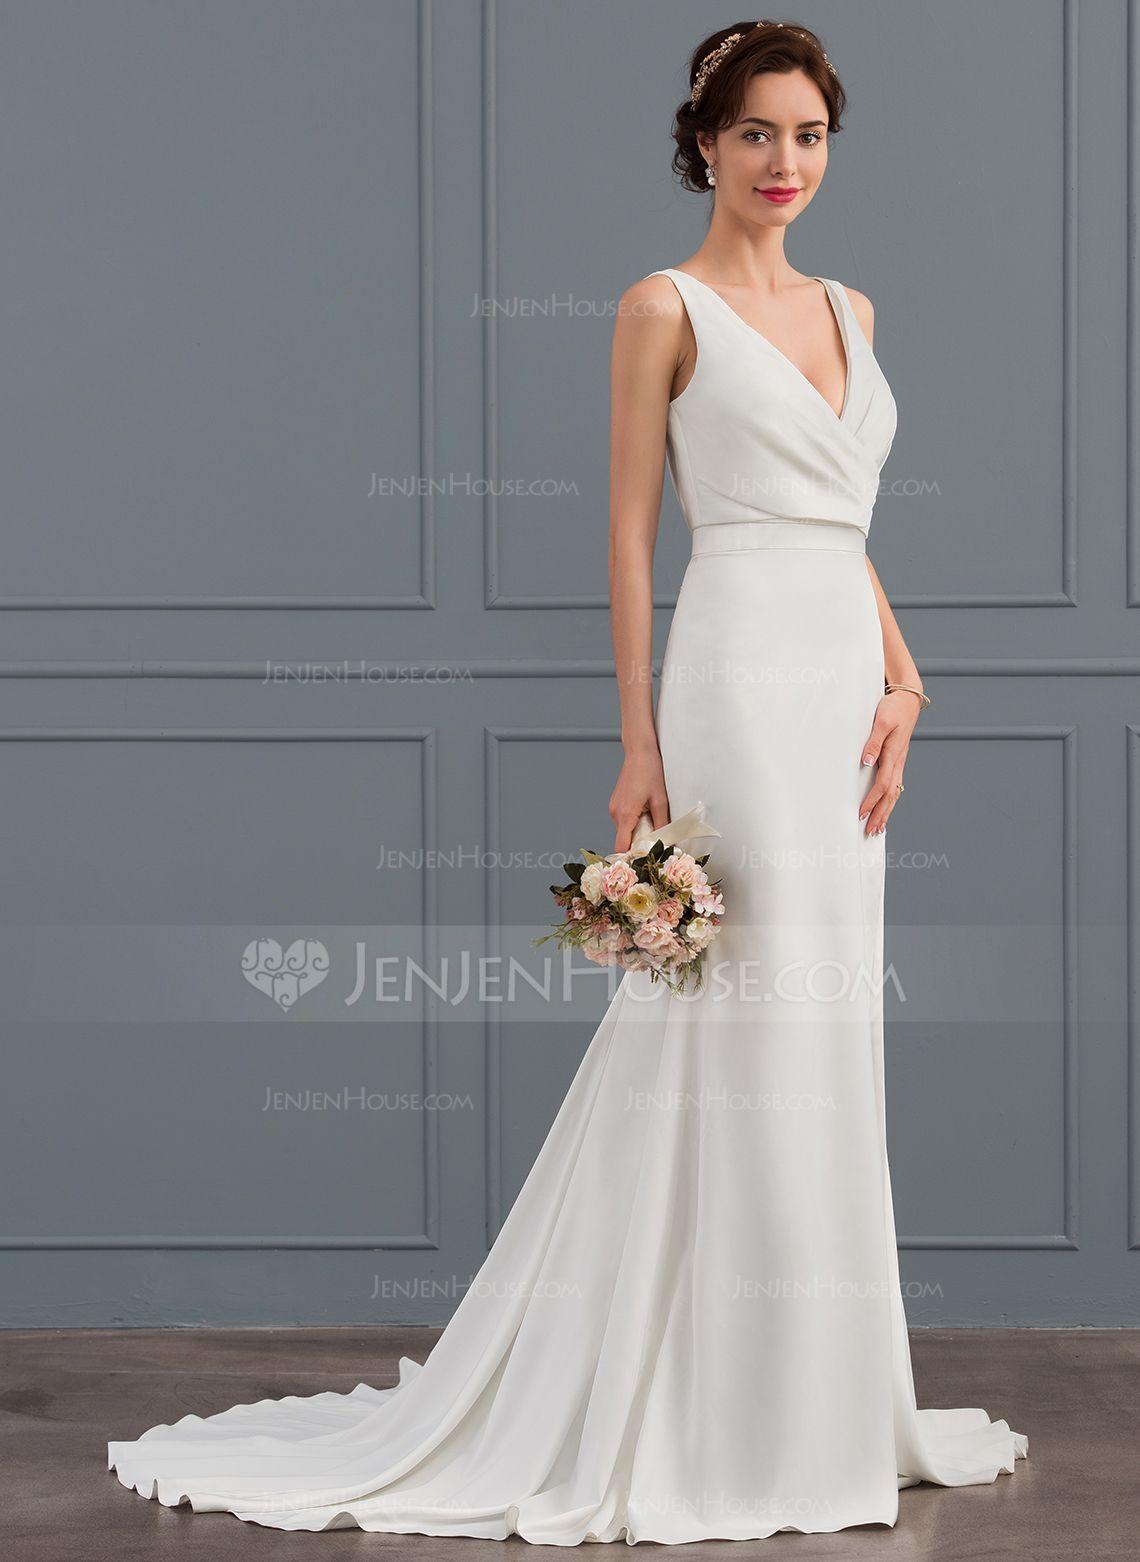 80d0627ff39a Trumpet/Mermaid V-neck Court Train Stretch Crepe Wedding Dress With Ruffle  Split Front (002127275) - JenJenHouse